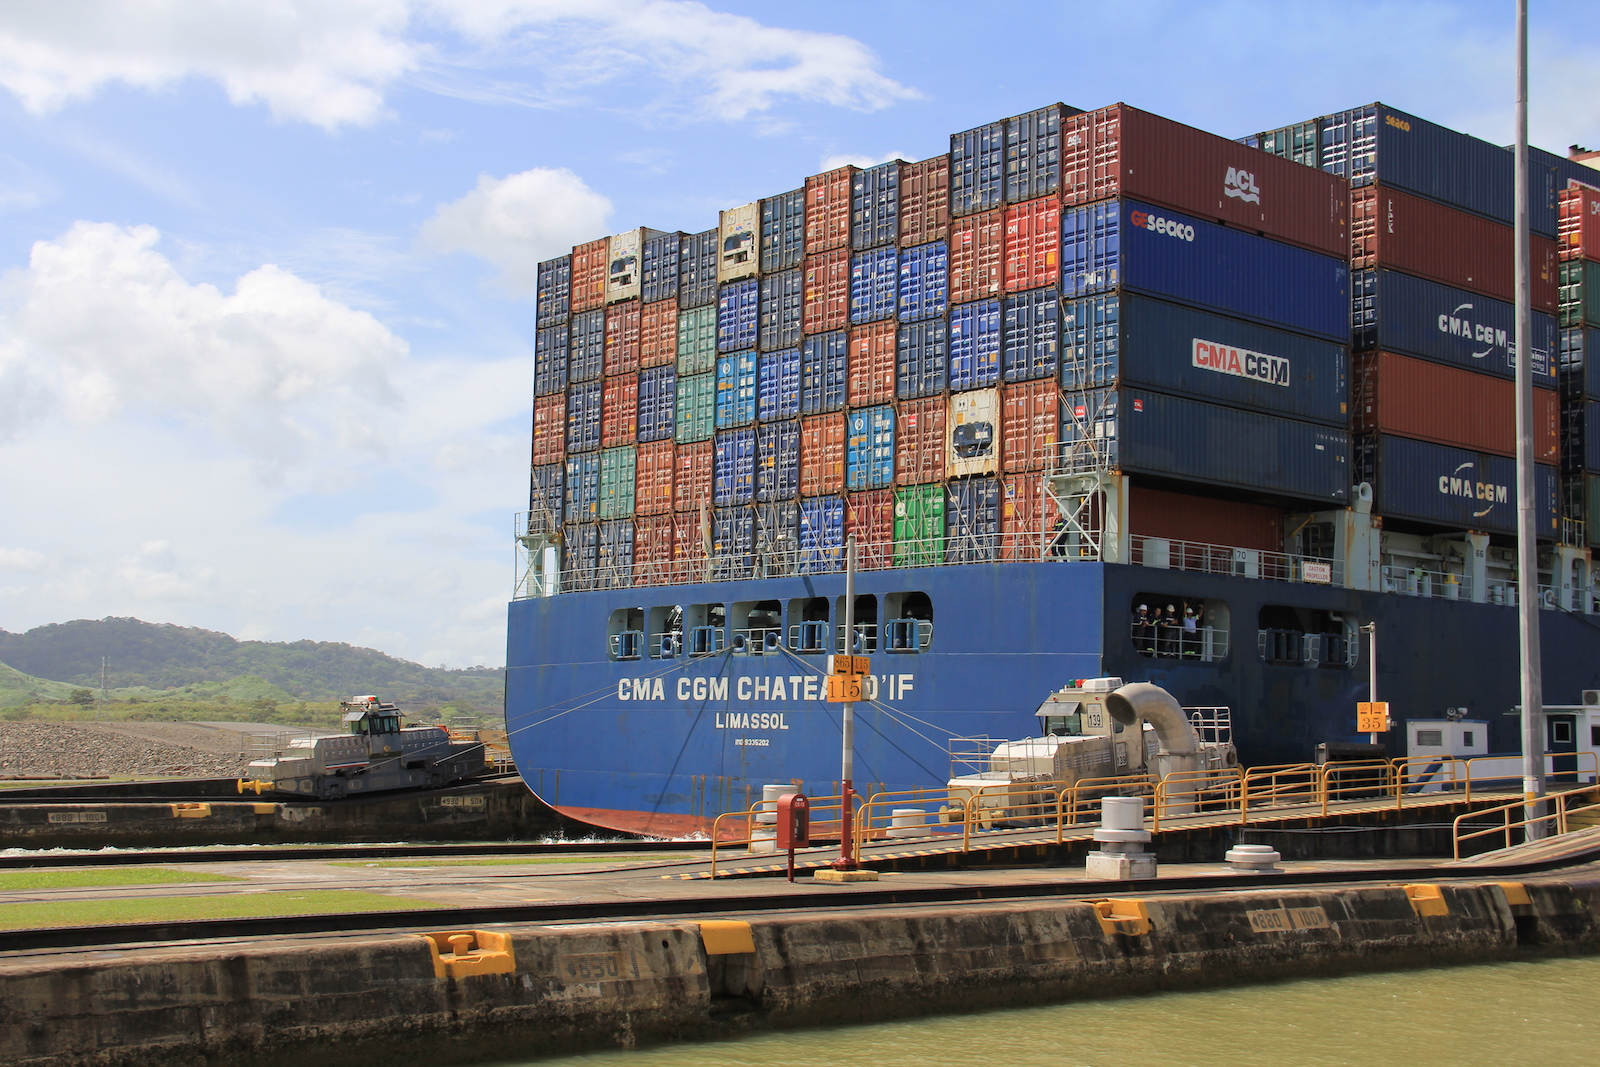 Panama Canal_Locks.JPG